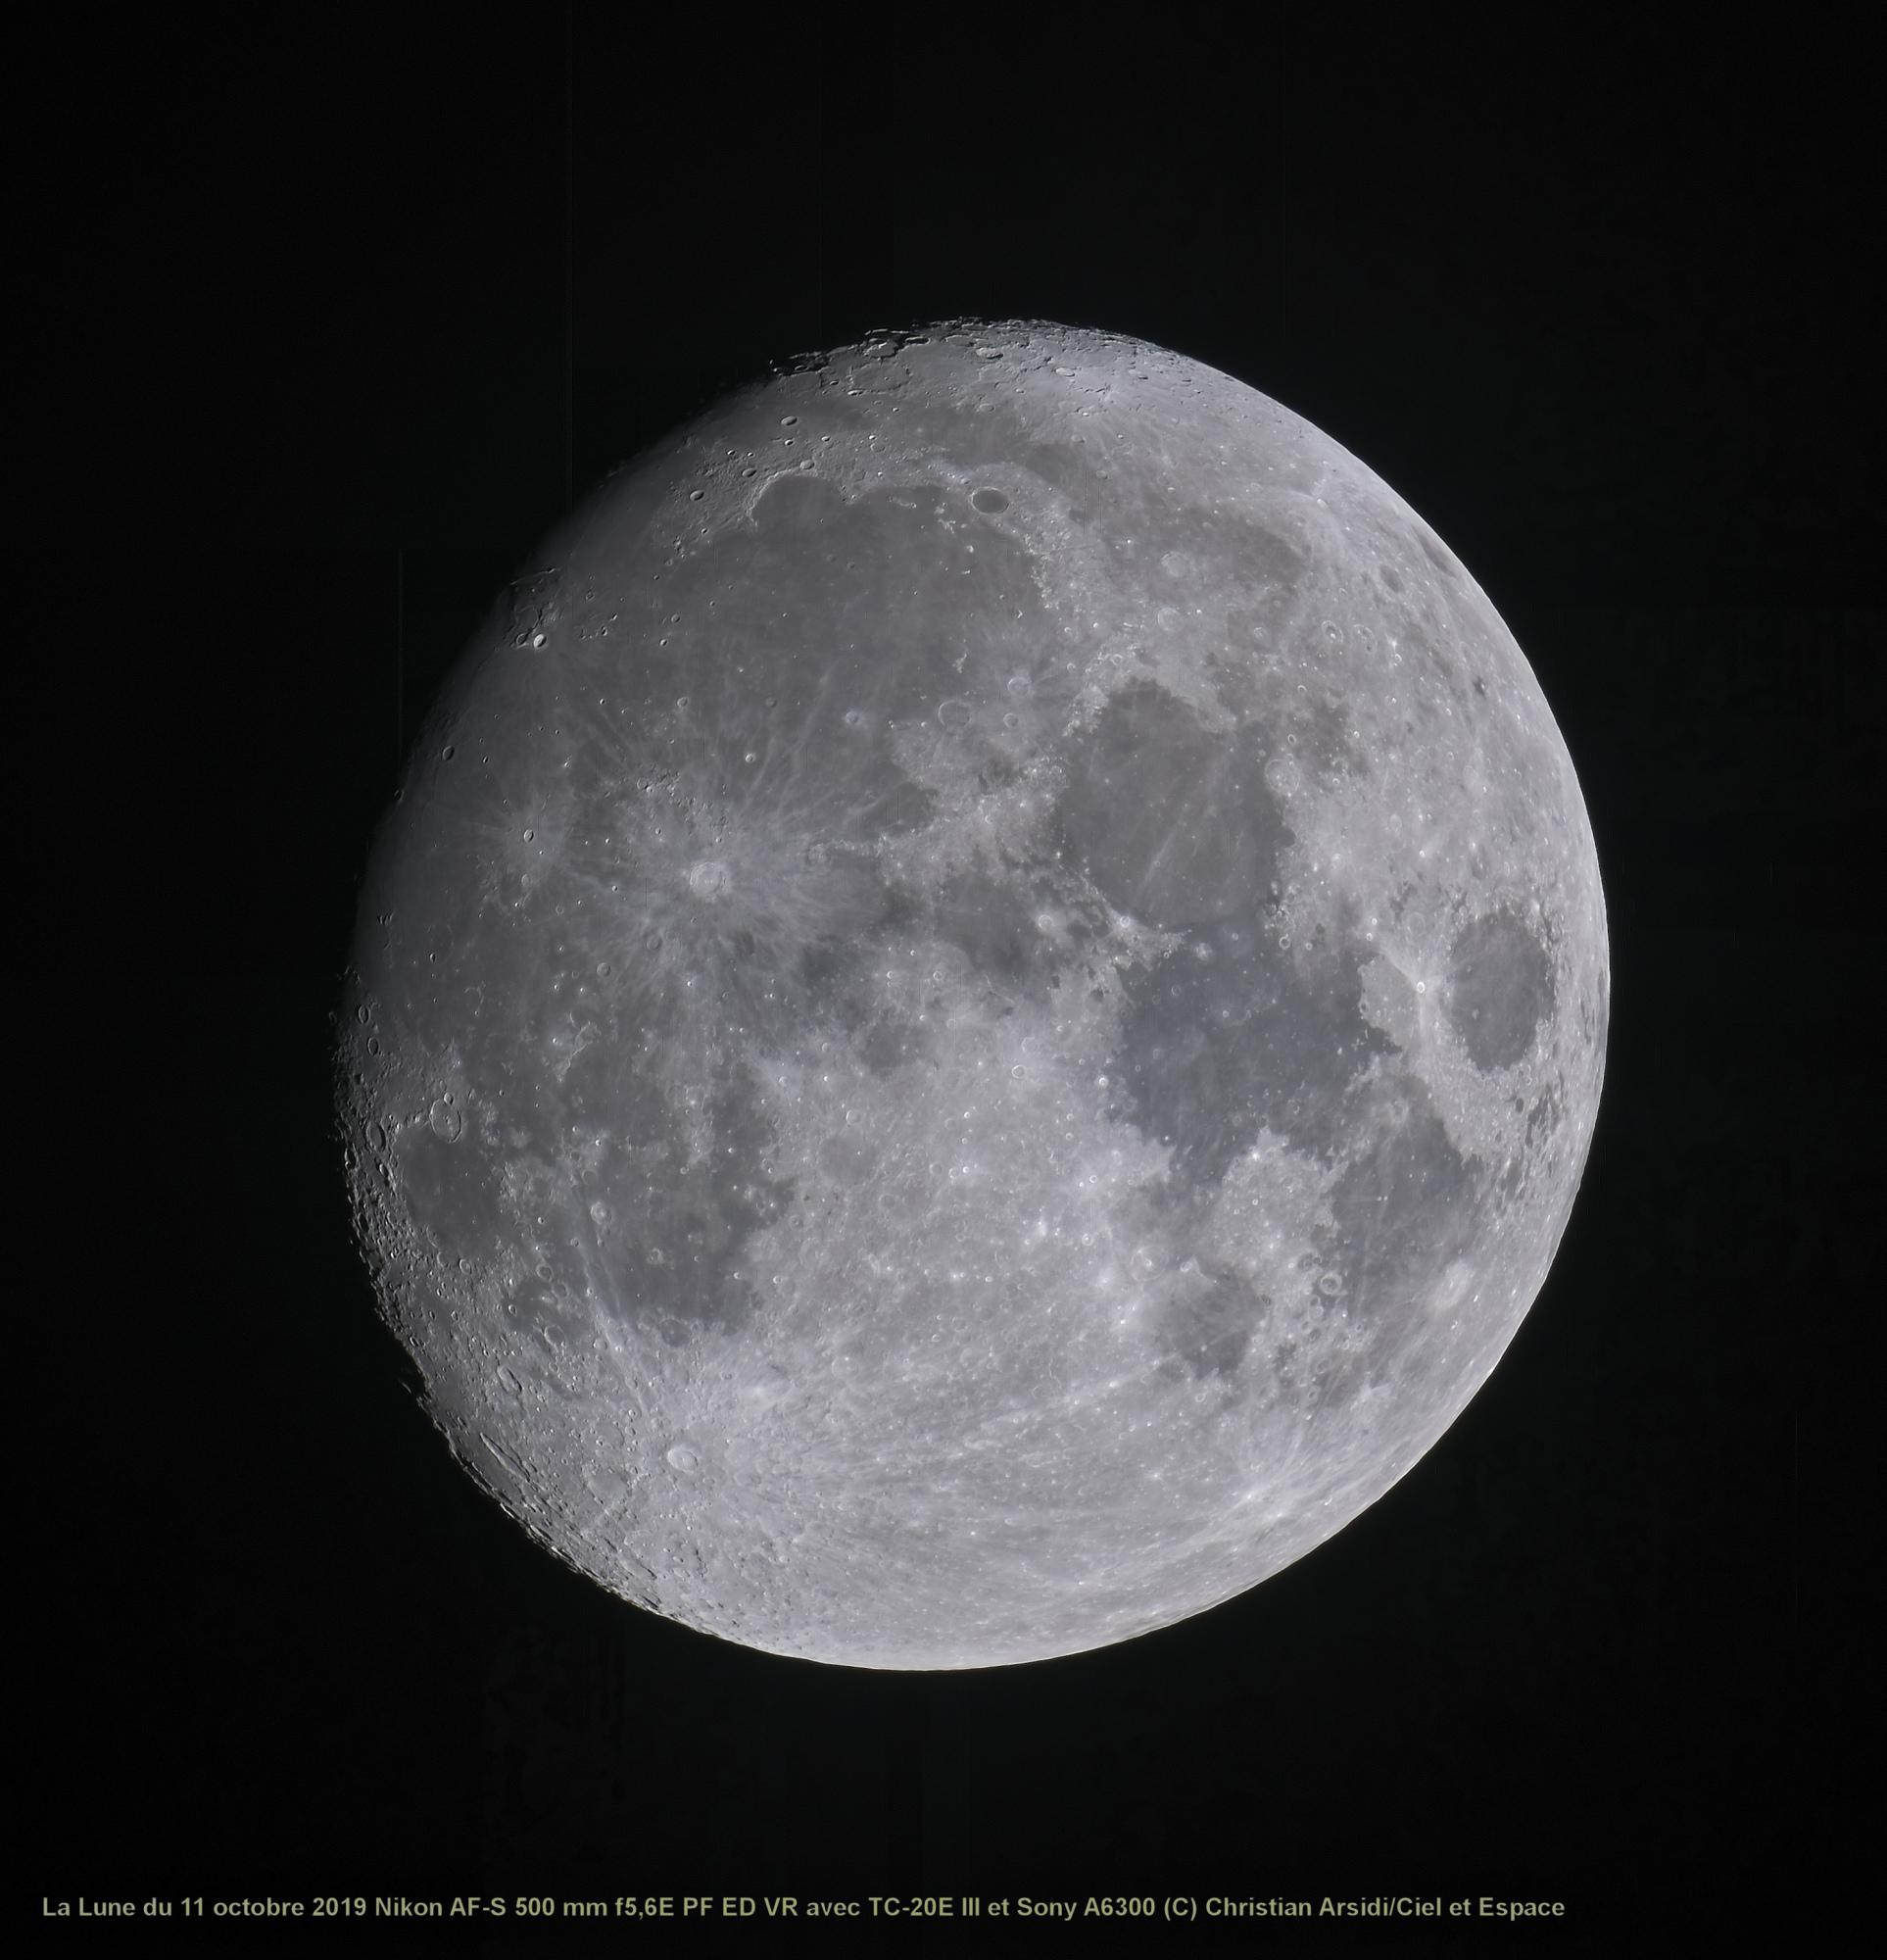 La_Lune_25_images_TTB_V2_100%_JPEG.jpg